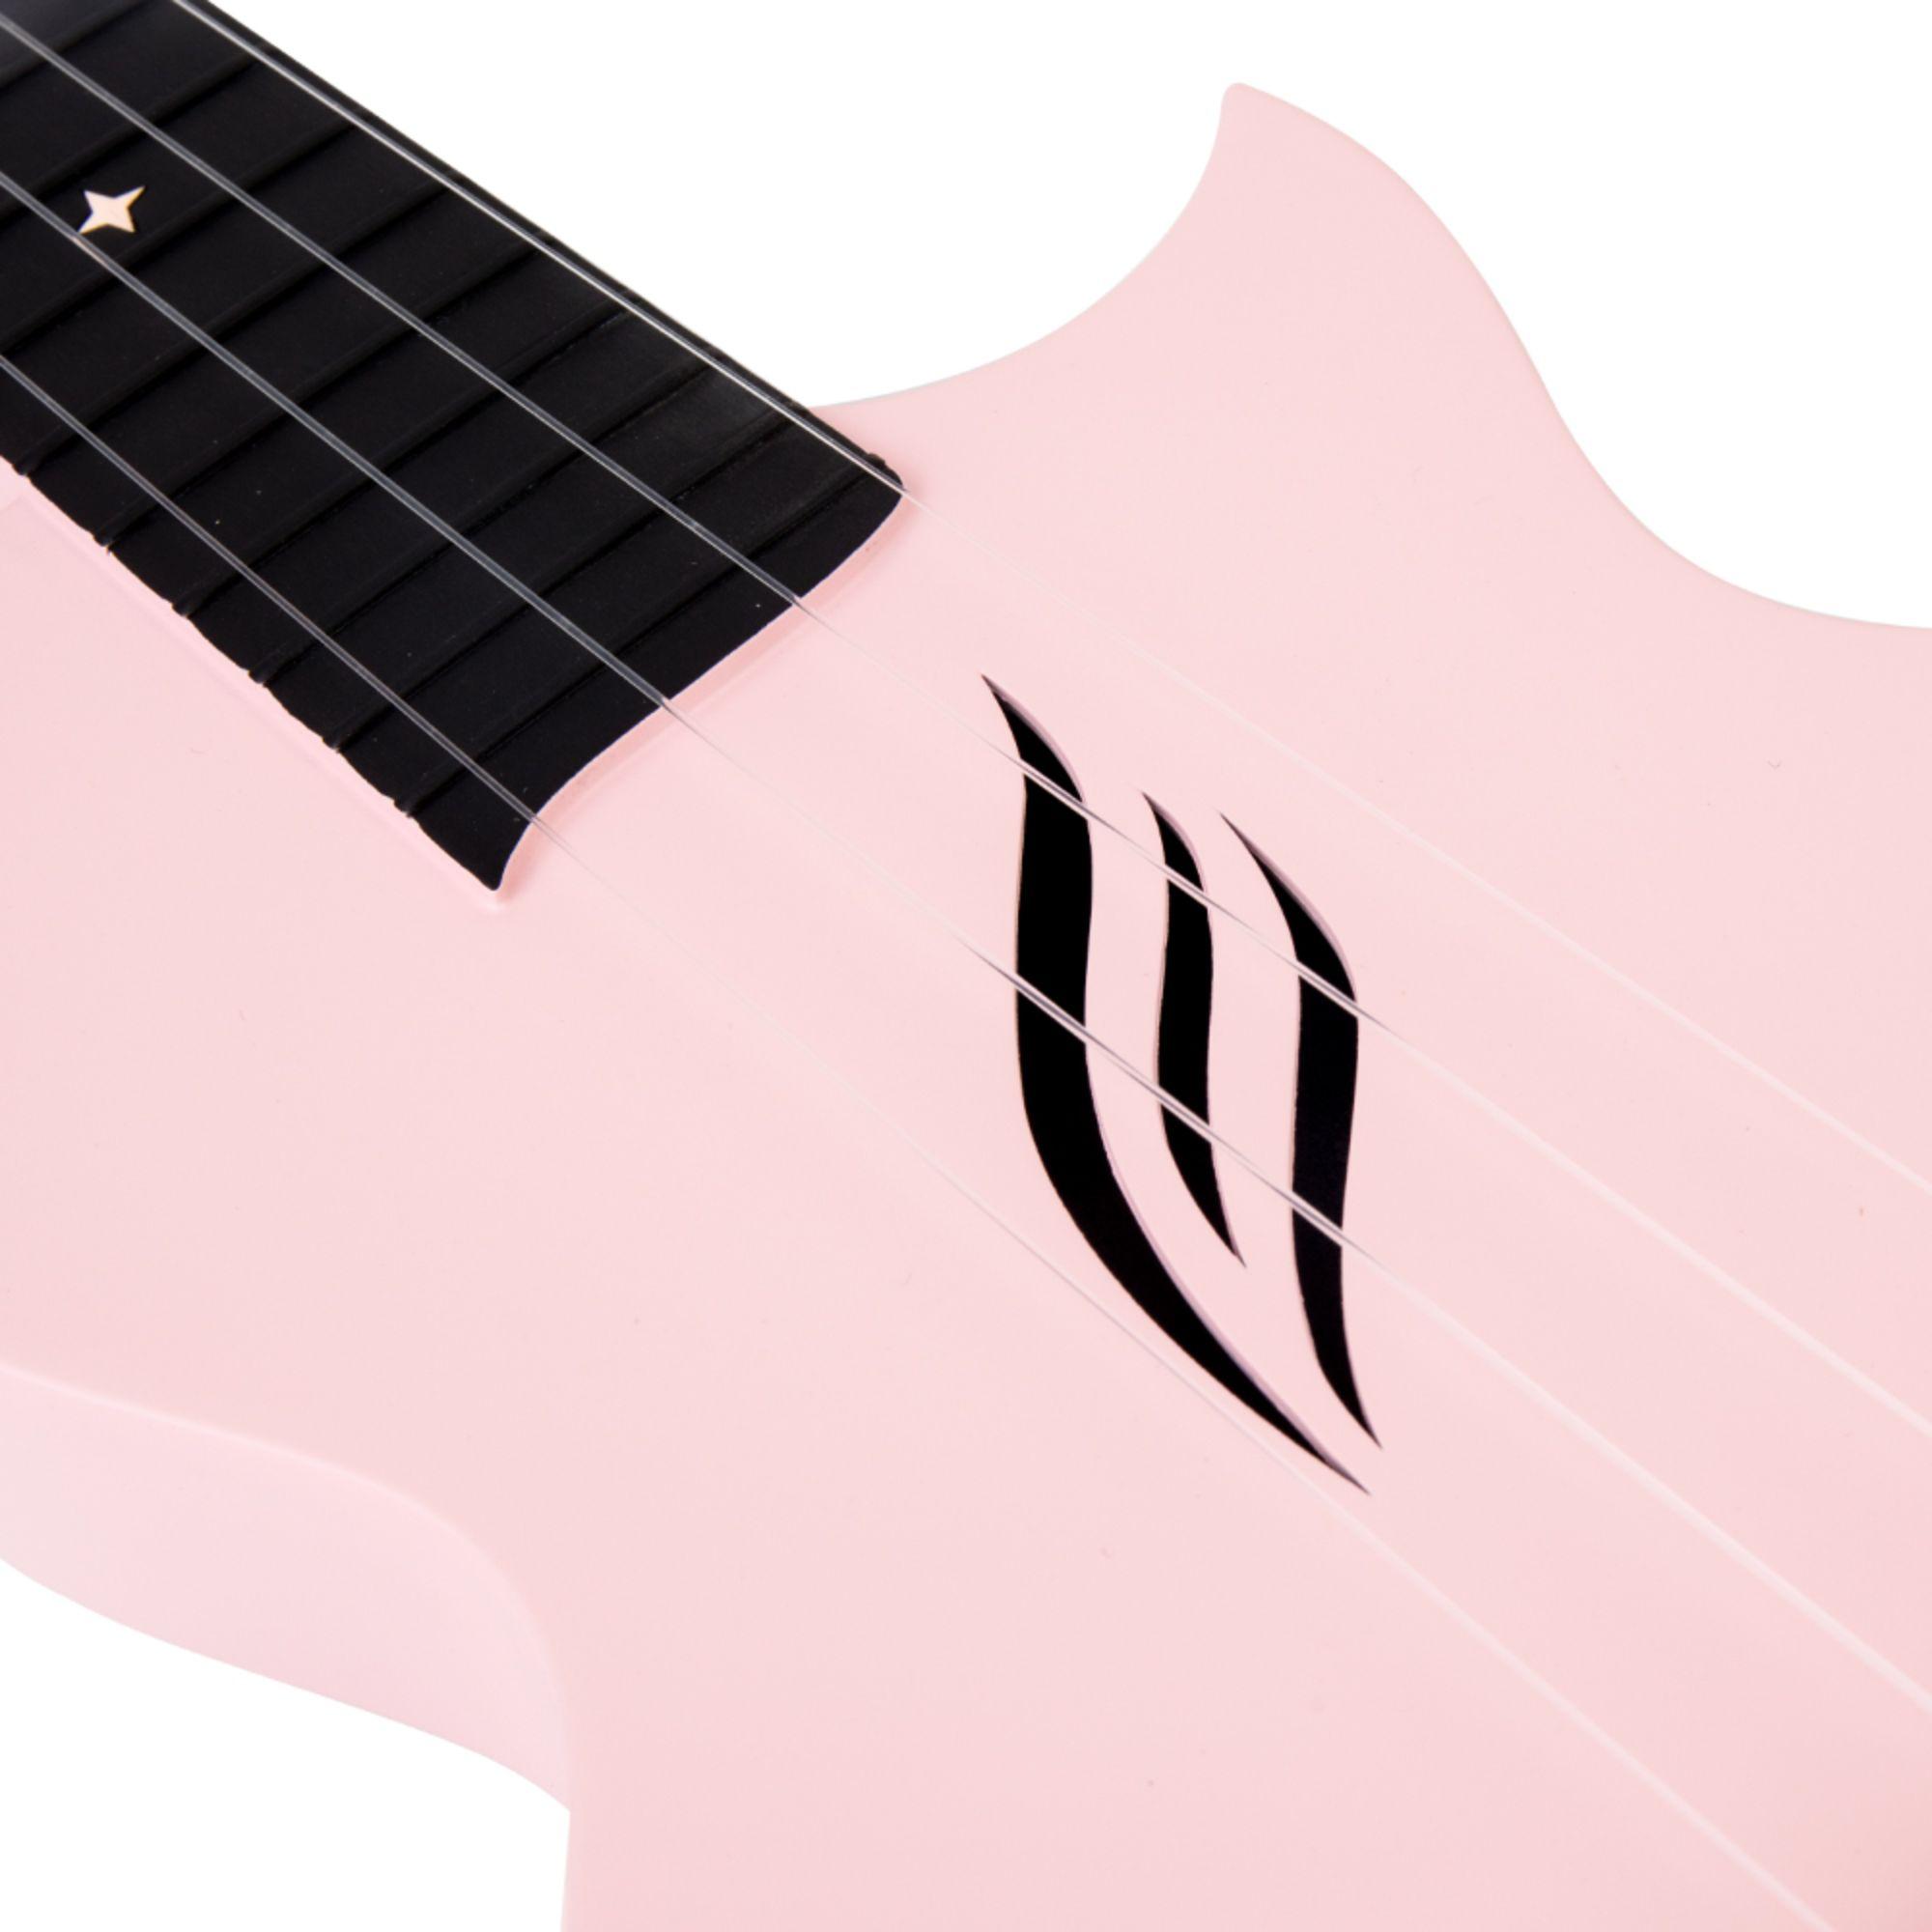 Enya Concert Nova U Carbon Fiber Travel Ukulele-Pink Matt